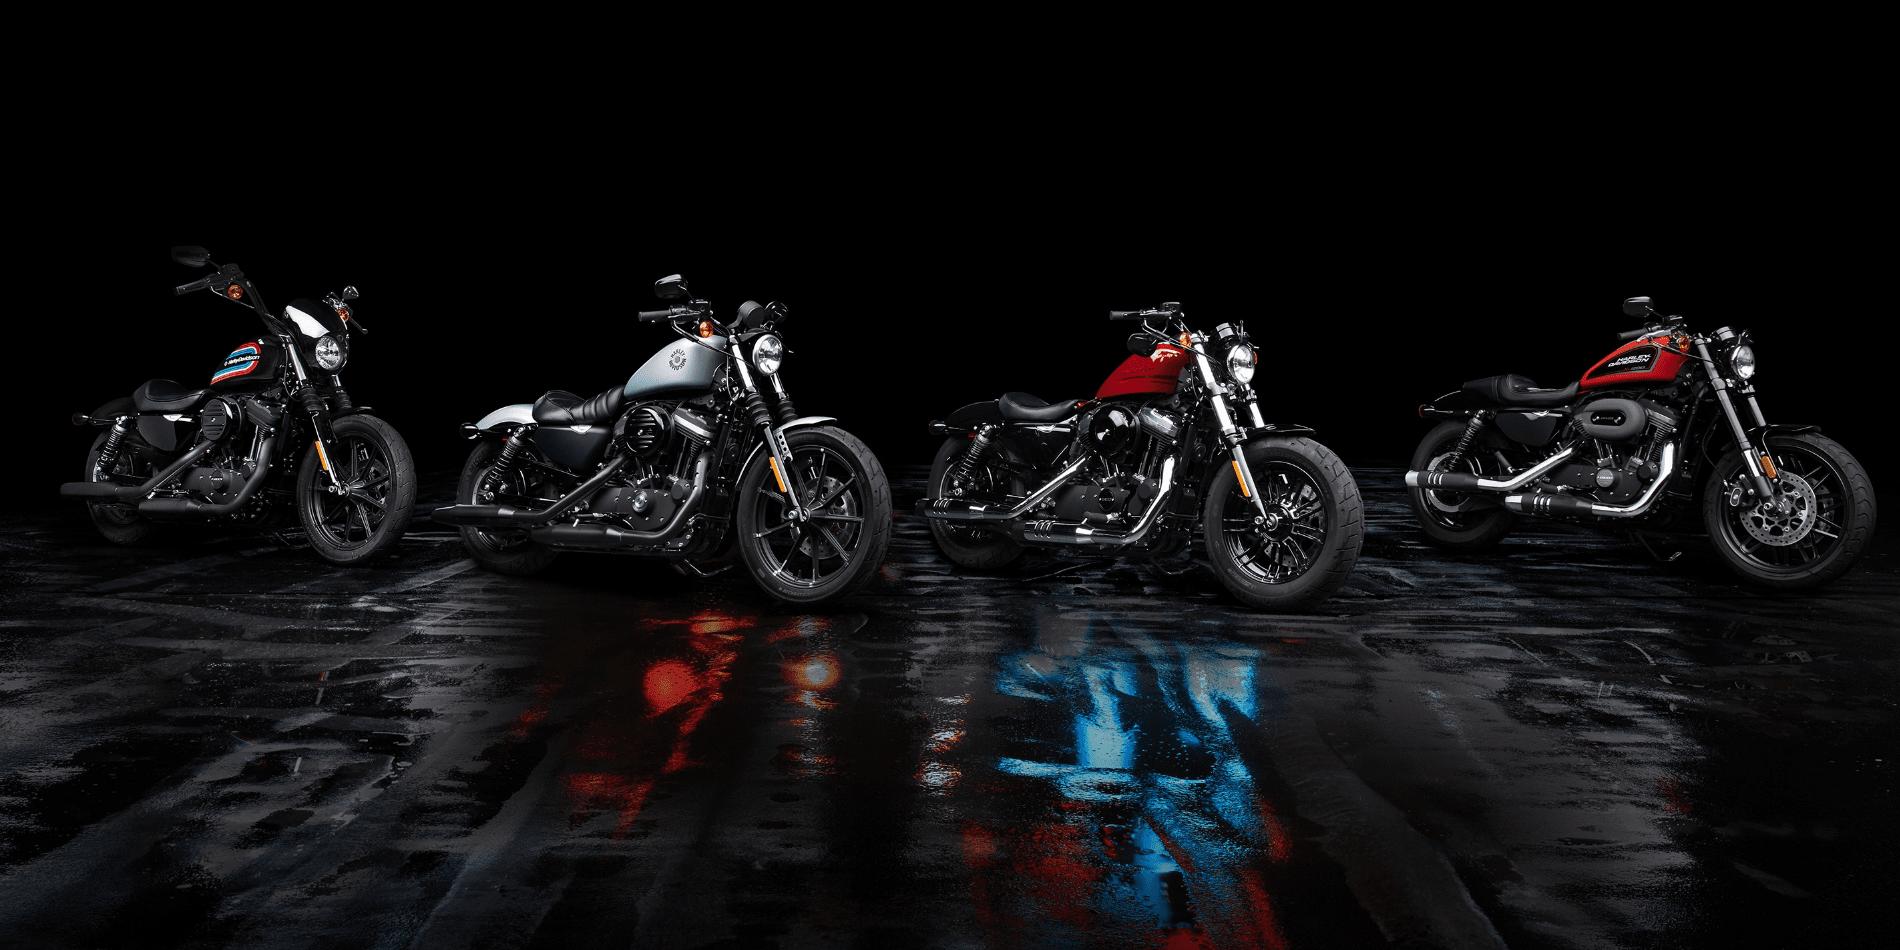 Harley davidson pavia sportster 2020 hd